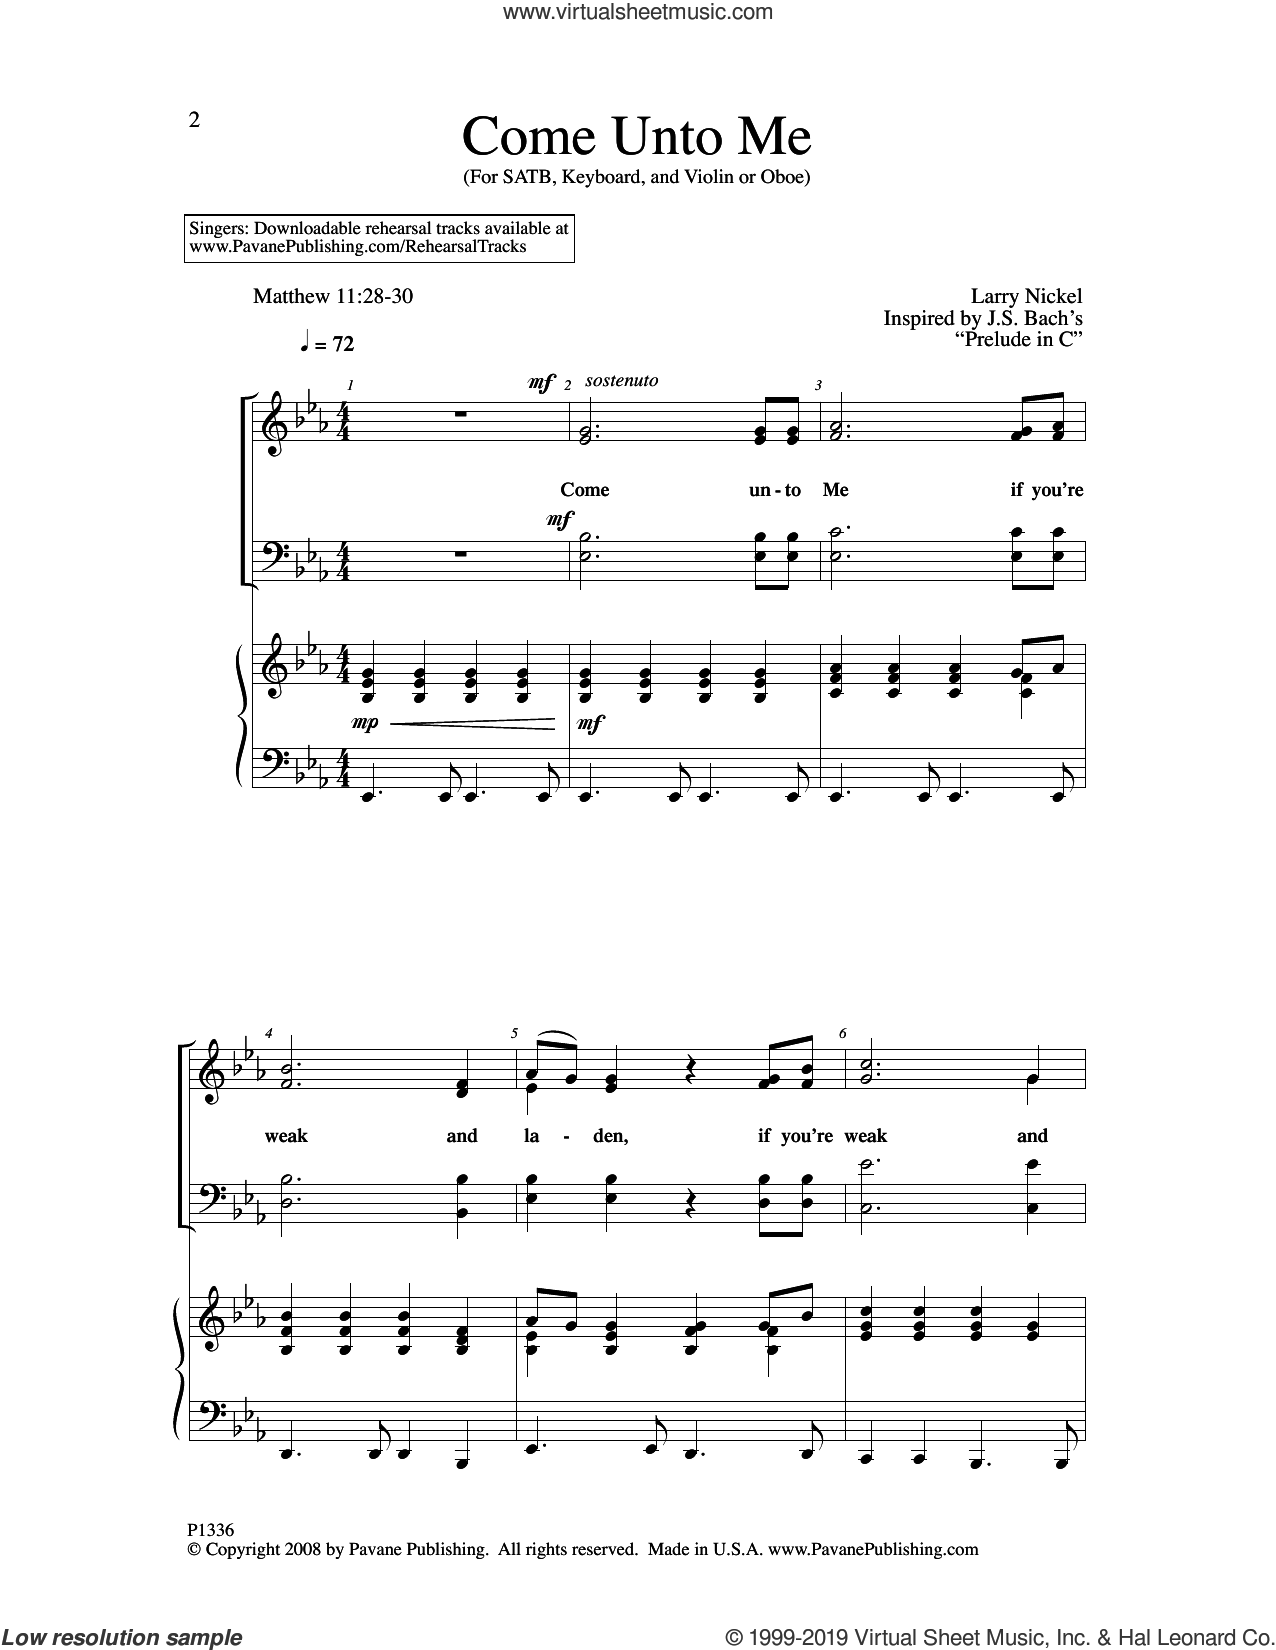 Come Unto Me sheet music for choir (SATB: soprano, alto, tenor, bass) by Larry Nickel, intermediate skill level